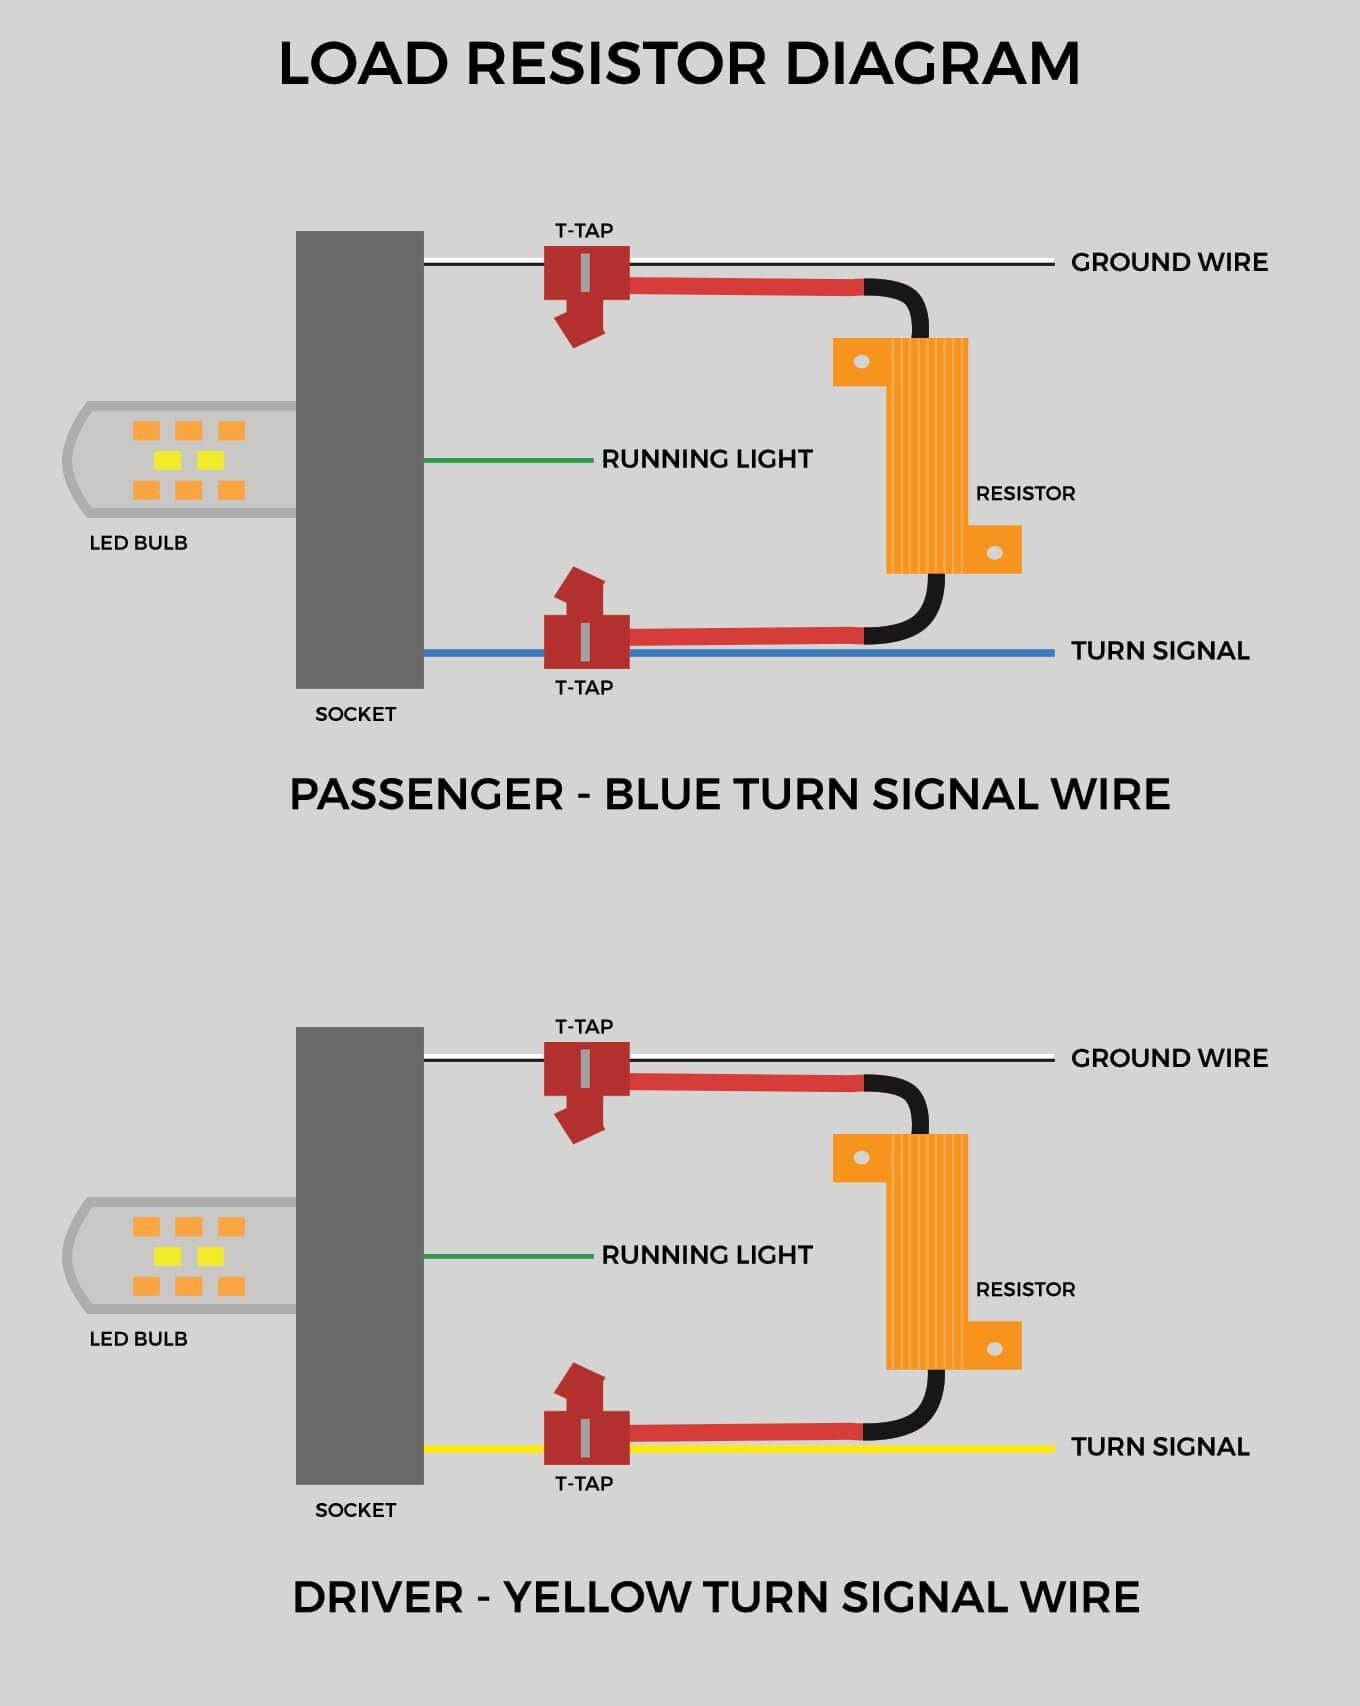 Wiring Diagram for Turn Signal Flasher Turn Signal Light Wiring Diagram Wiring Diagram Paper Of Wiring Diagram for Turn Signal Flasher